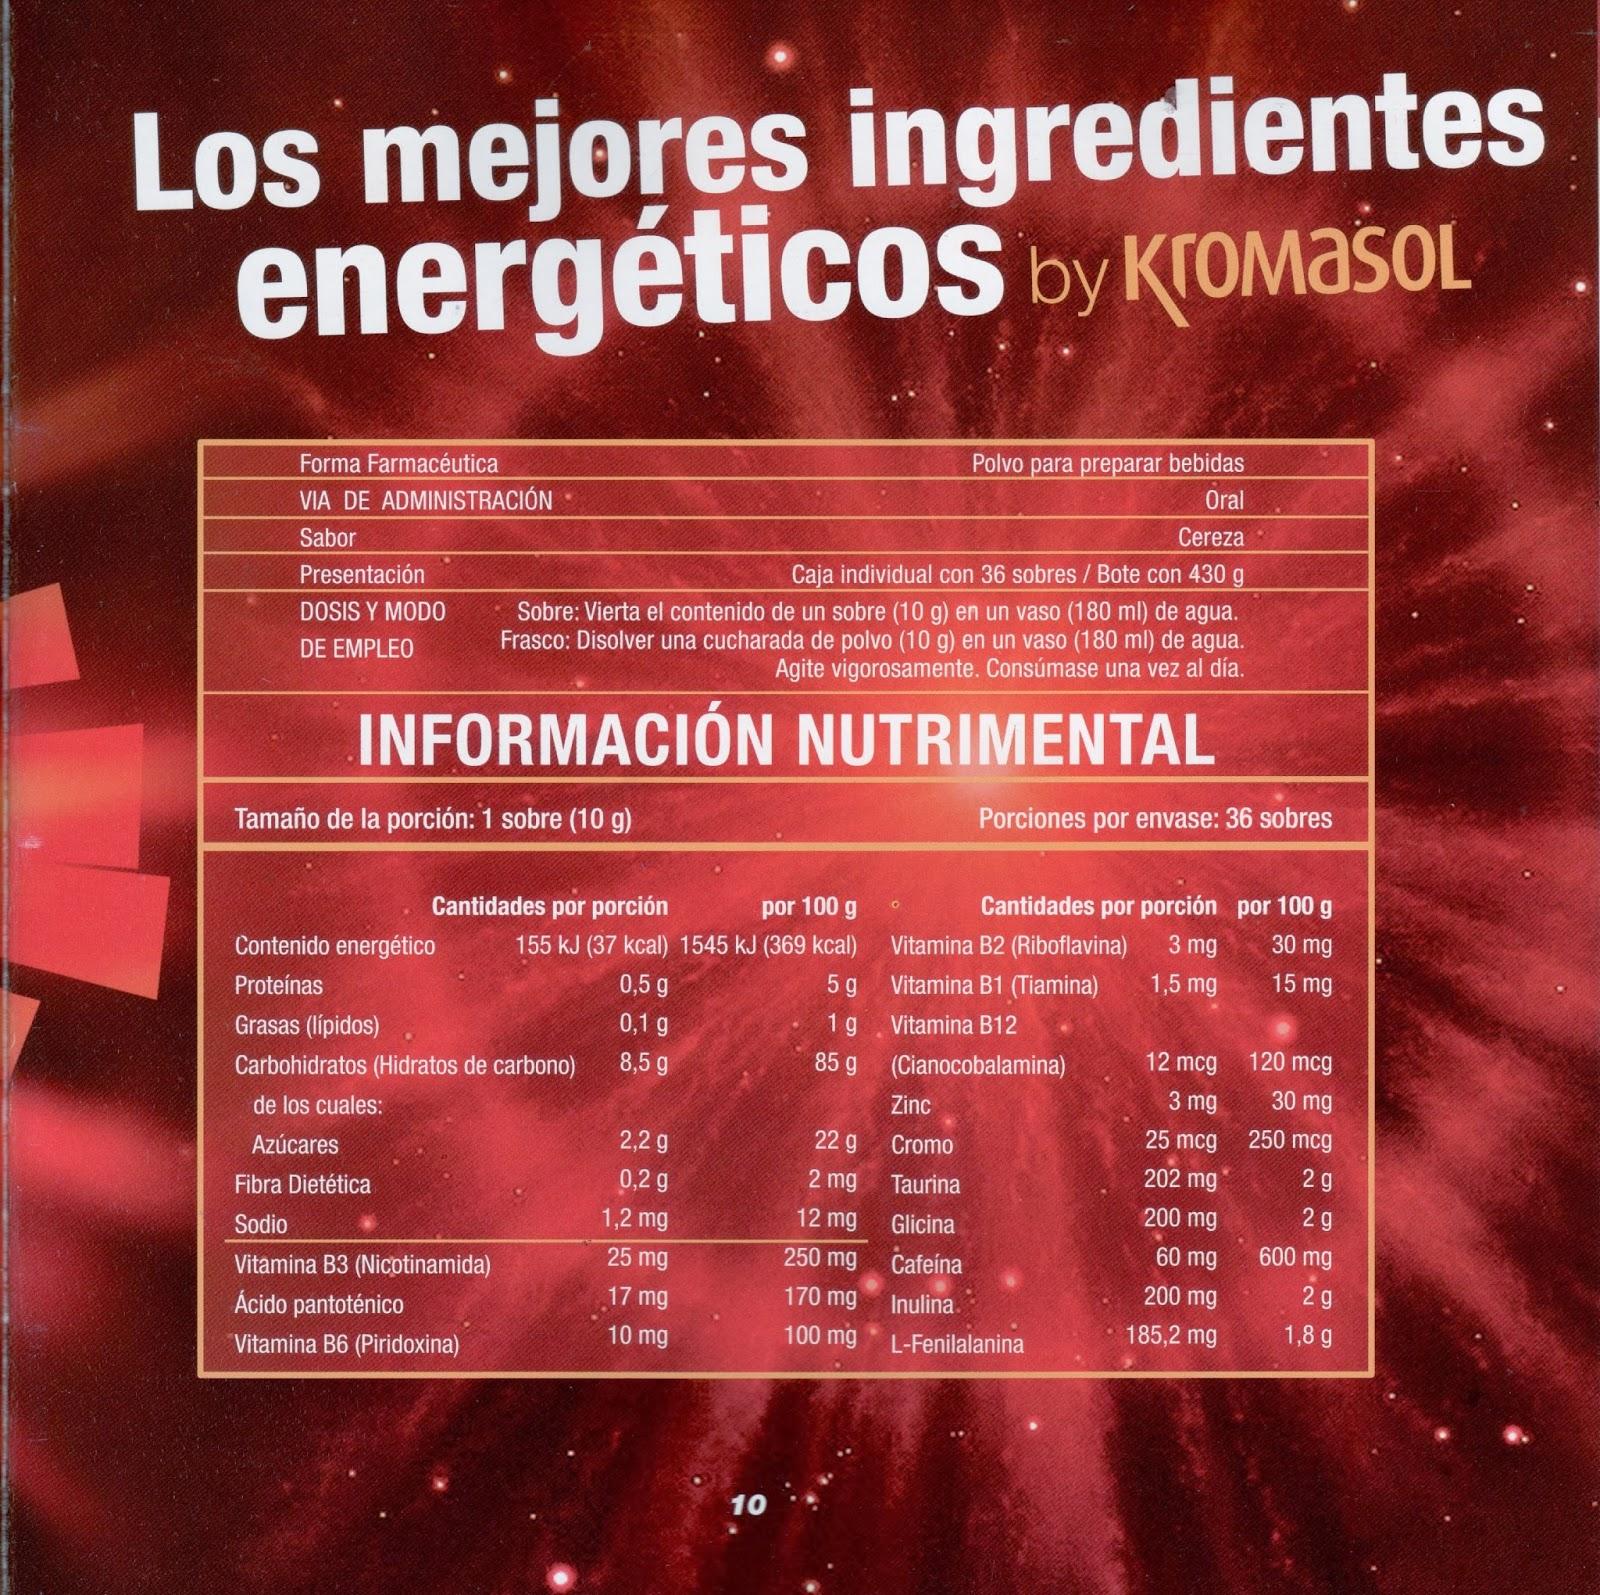 Nox by kromasol testimonios